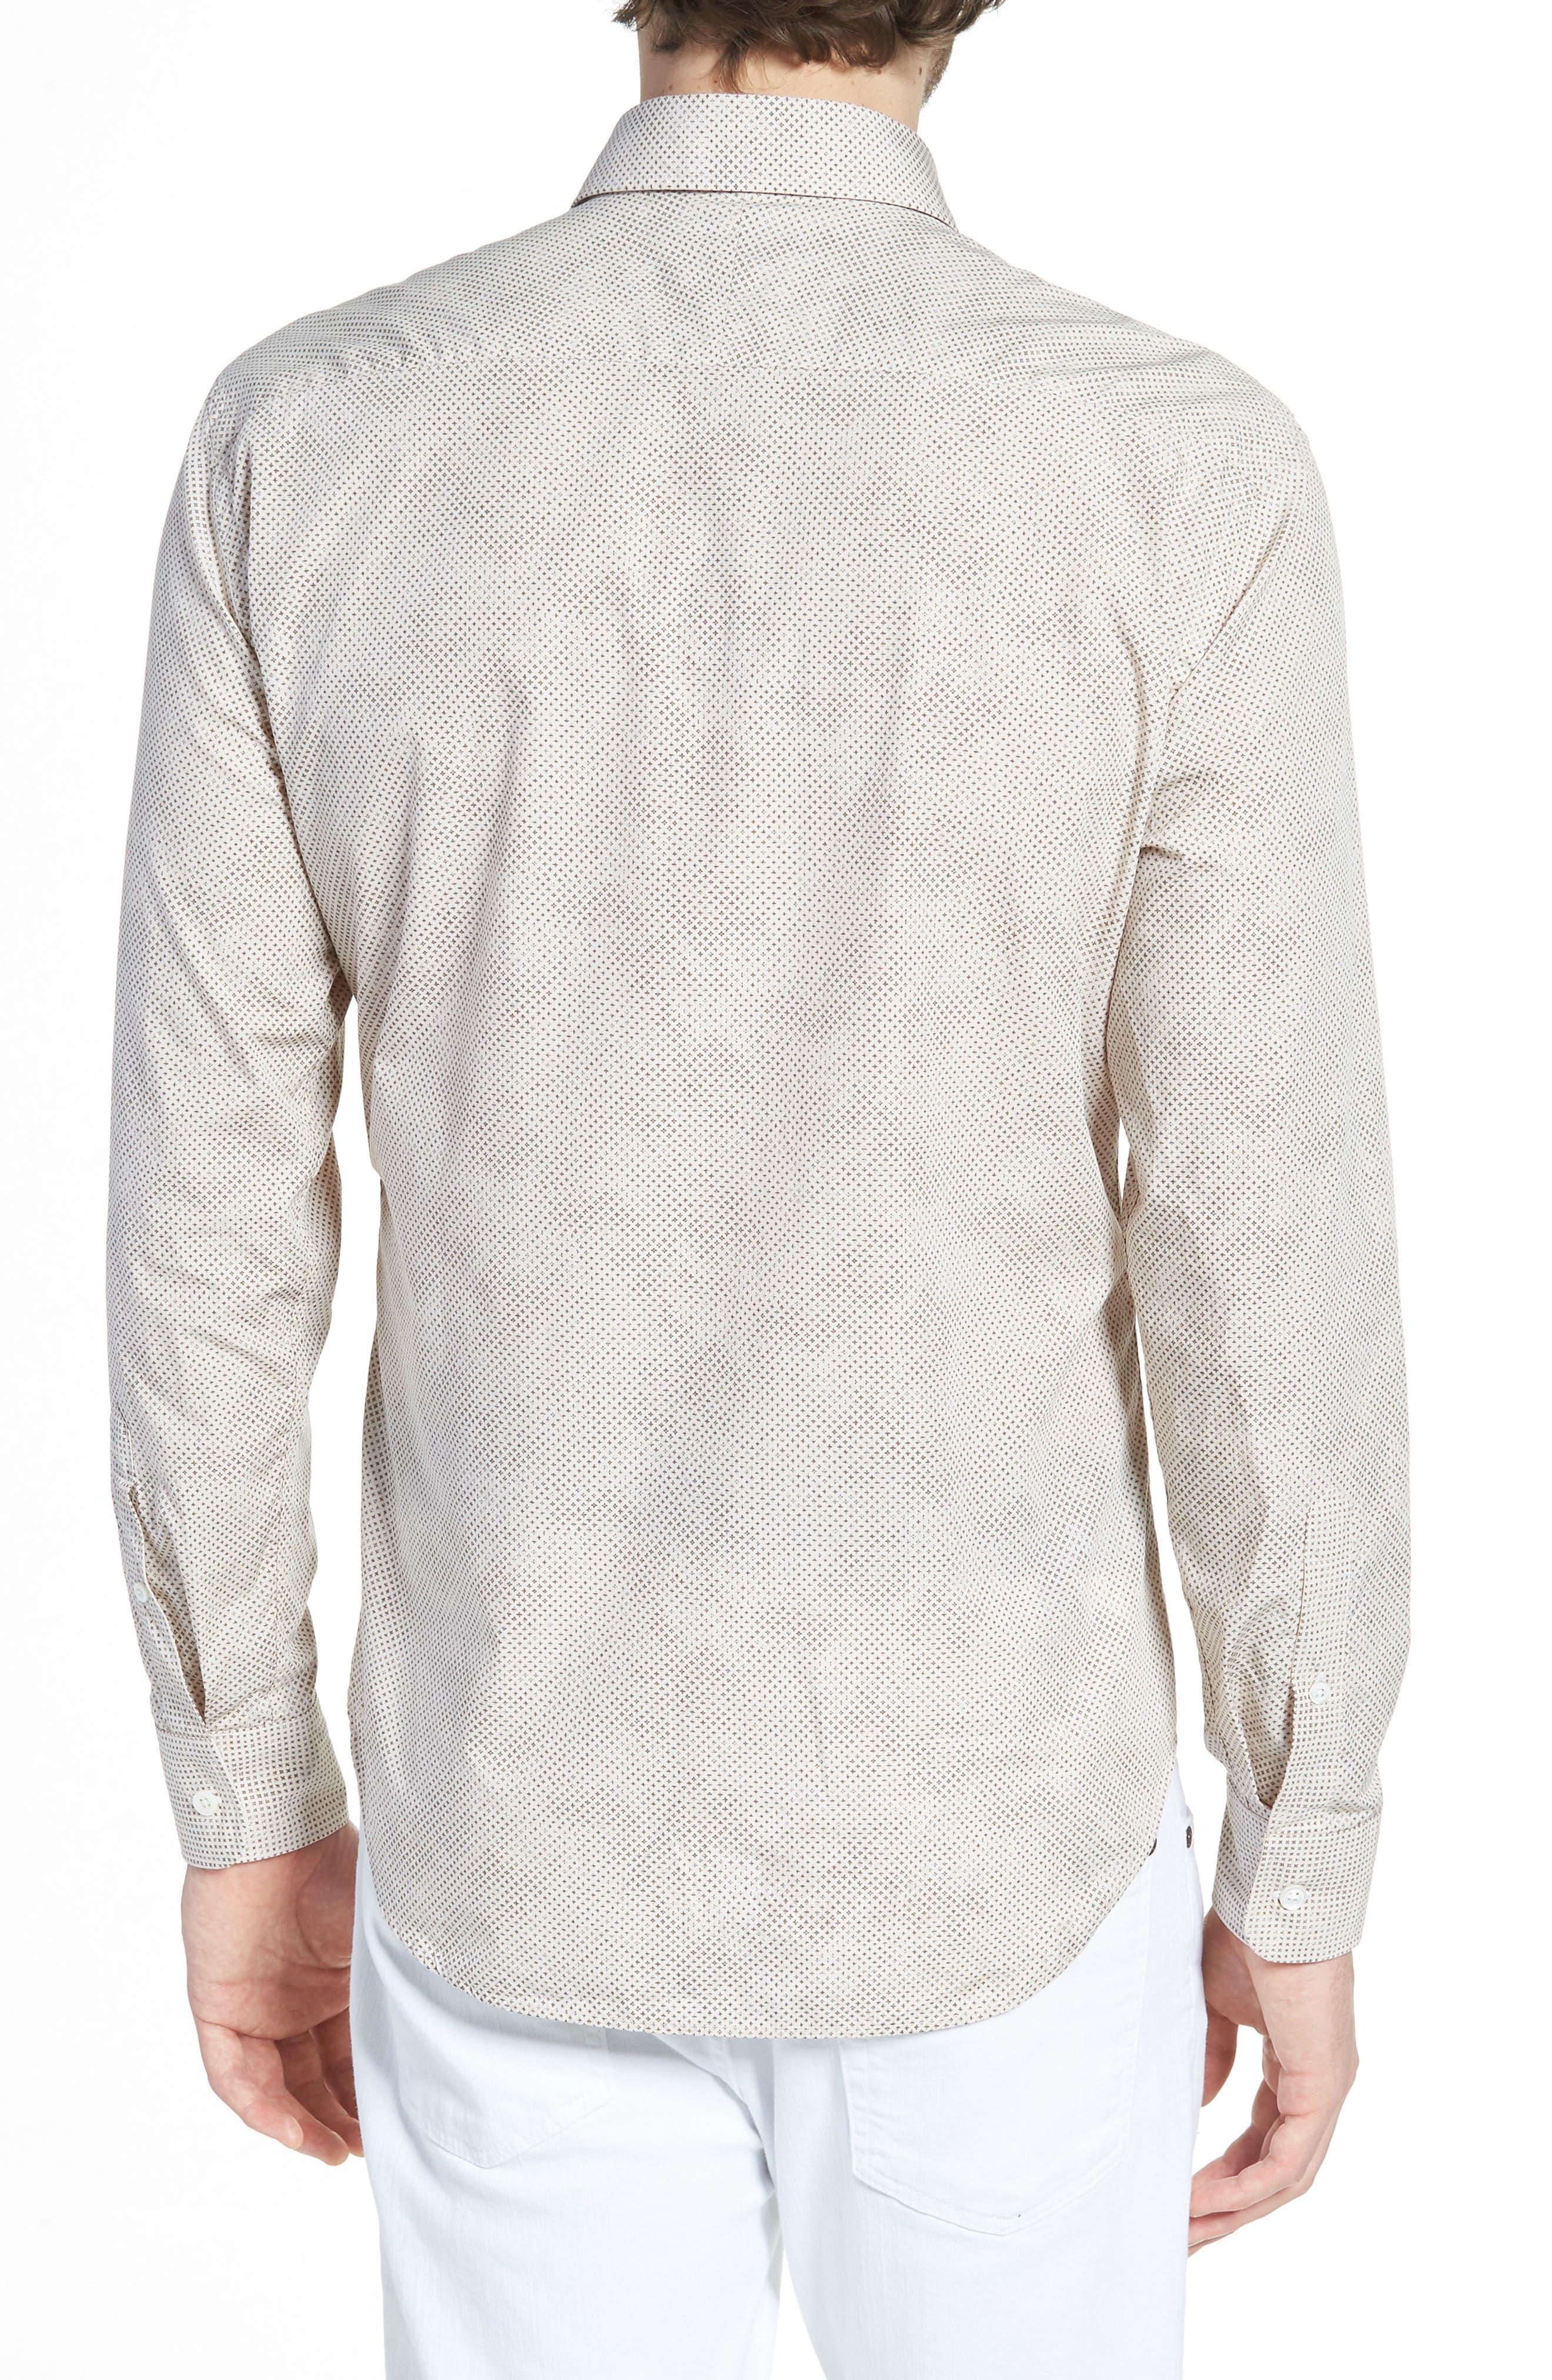 Kirby Sport Shirt,                             Alternate thumbnail 2, color,